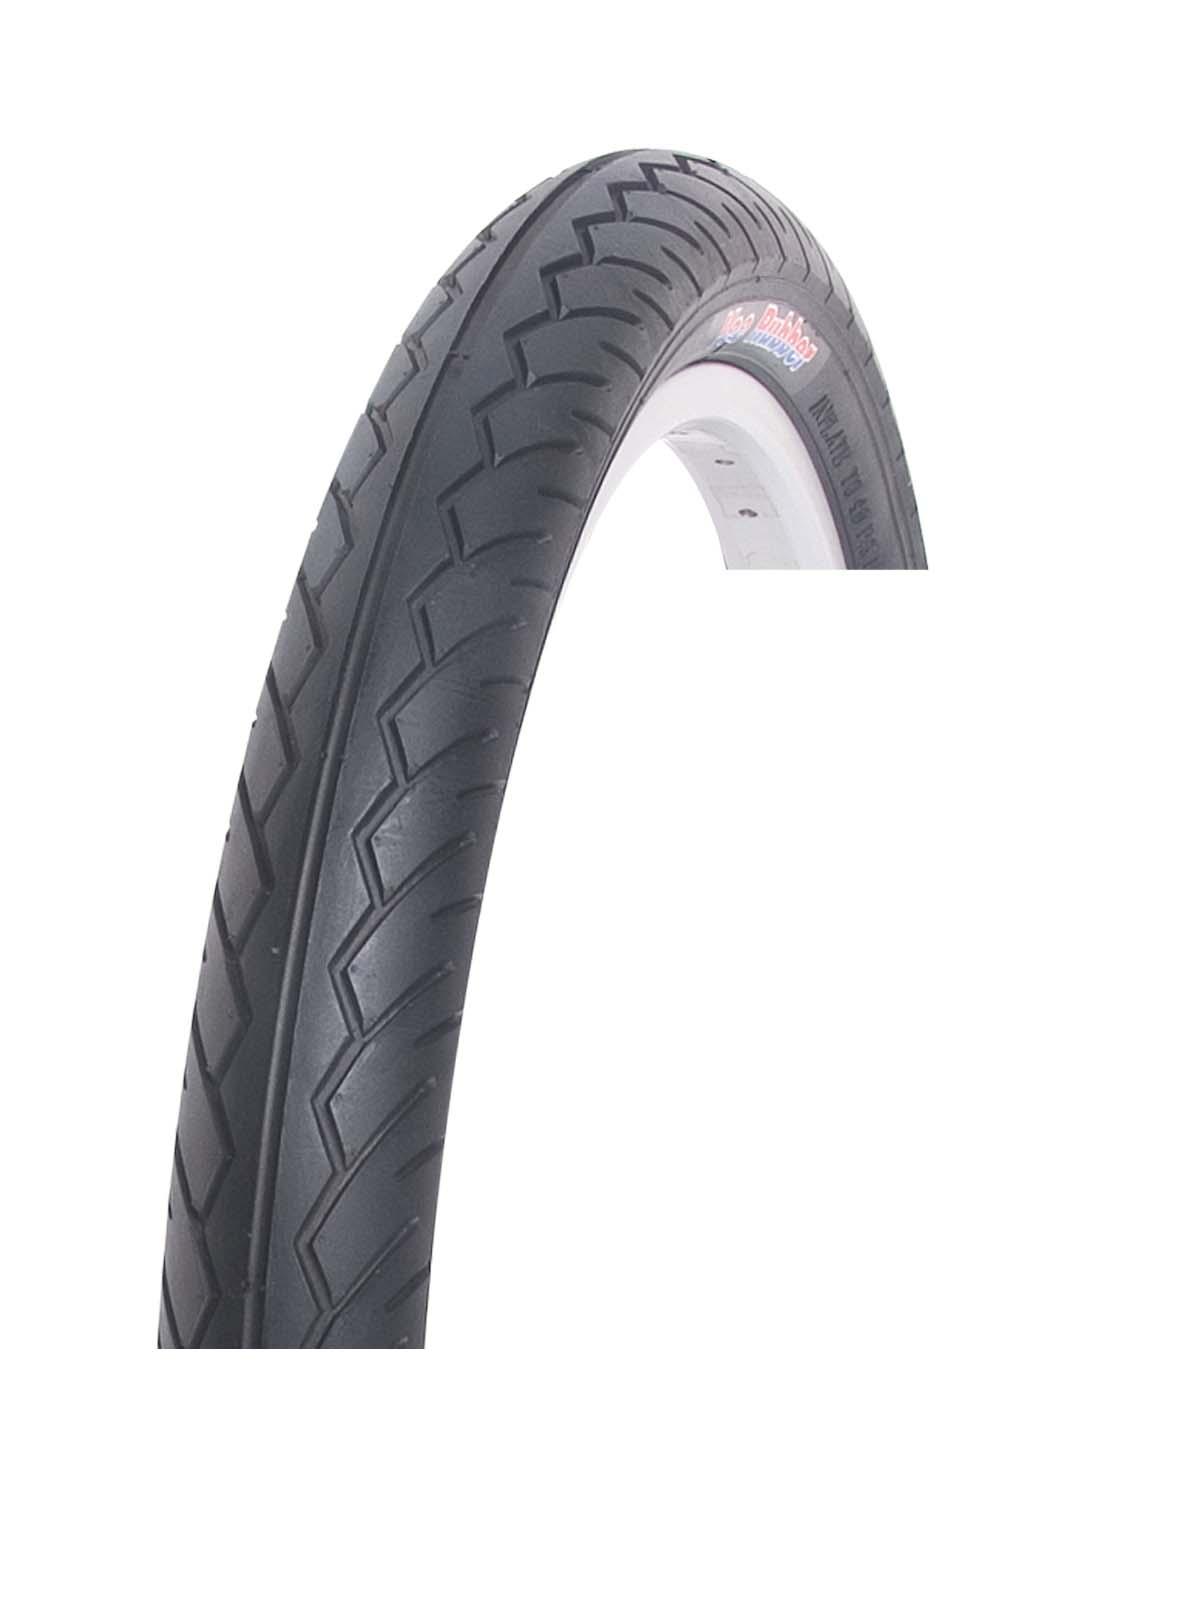 VEE RUBBER - Външна гума Vee Rubber 24x1,95 VRB284